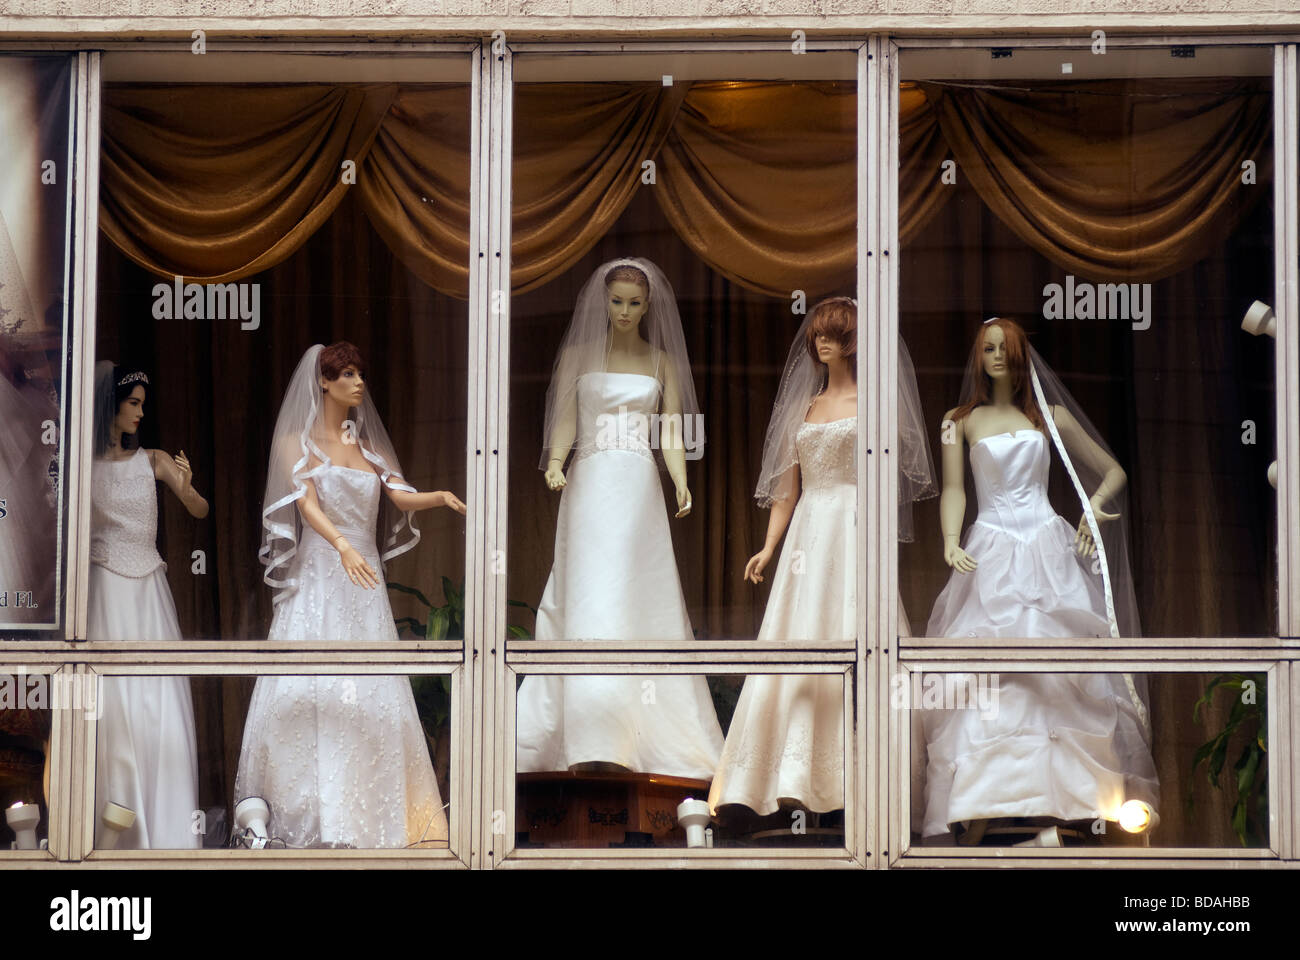 Wedding Dresses Display Stock Photos & Wedding Dresses Display Stock ...